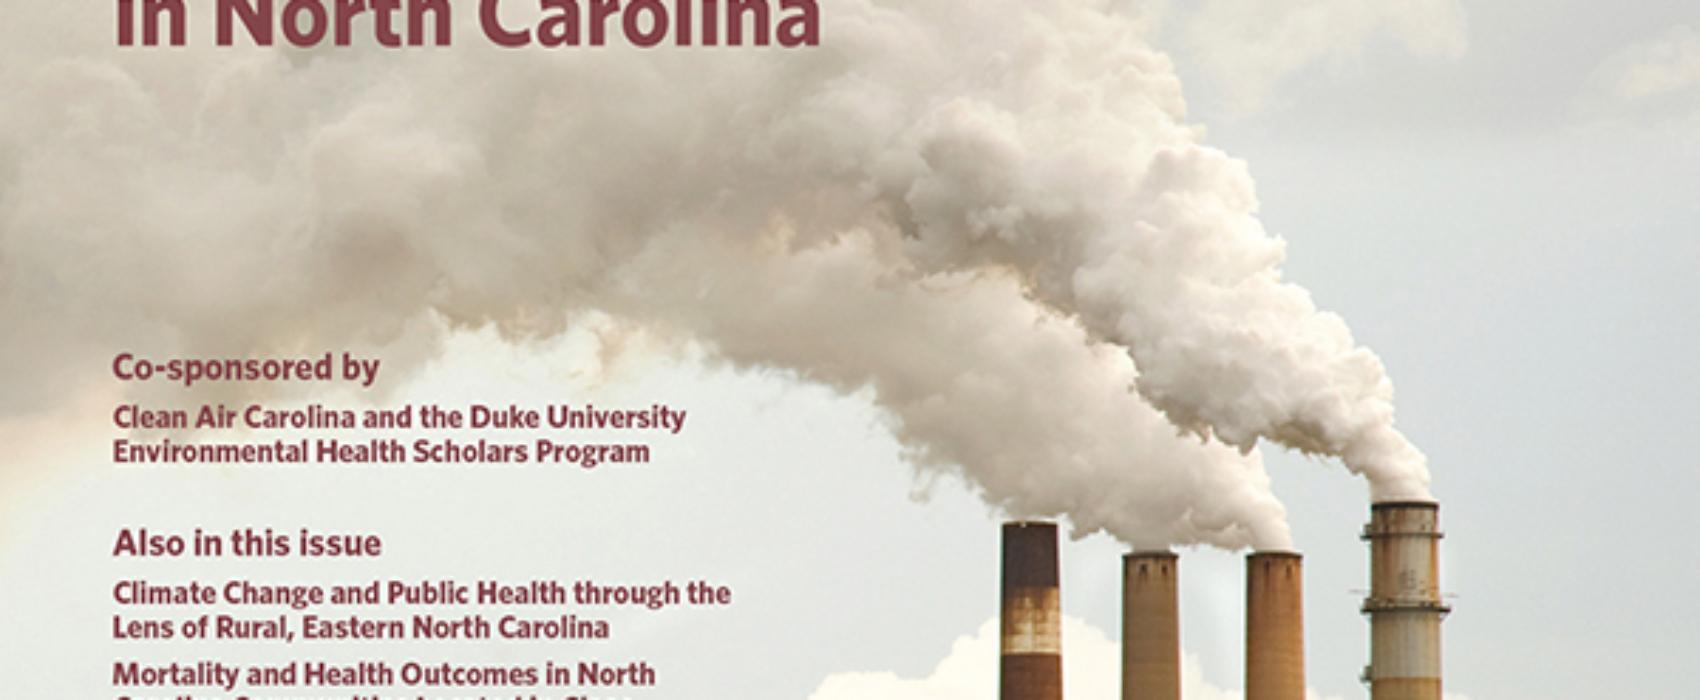 Health and the Environment in North Carolina